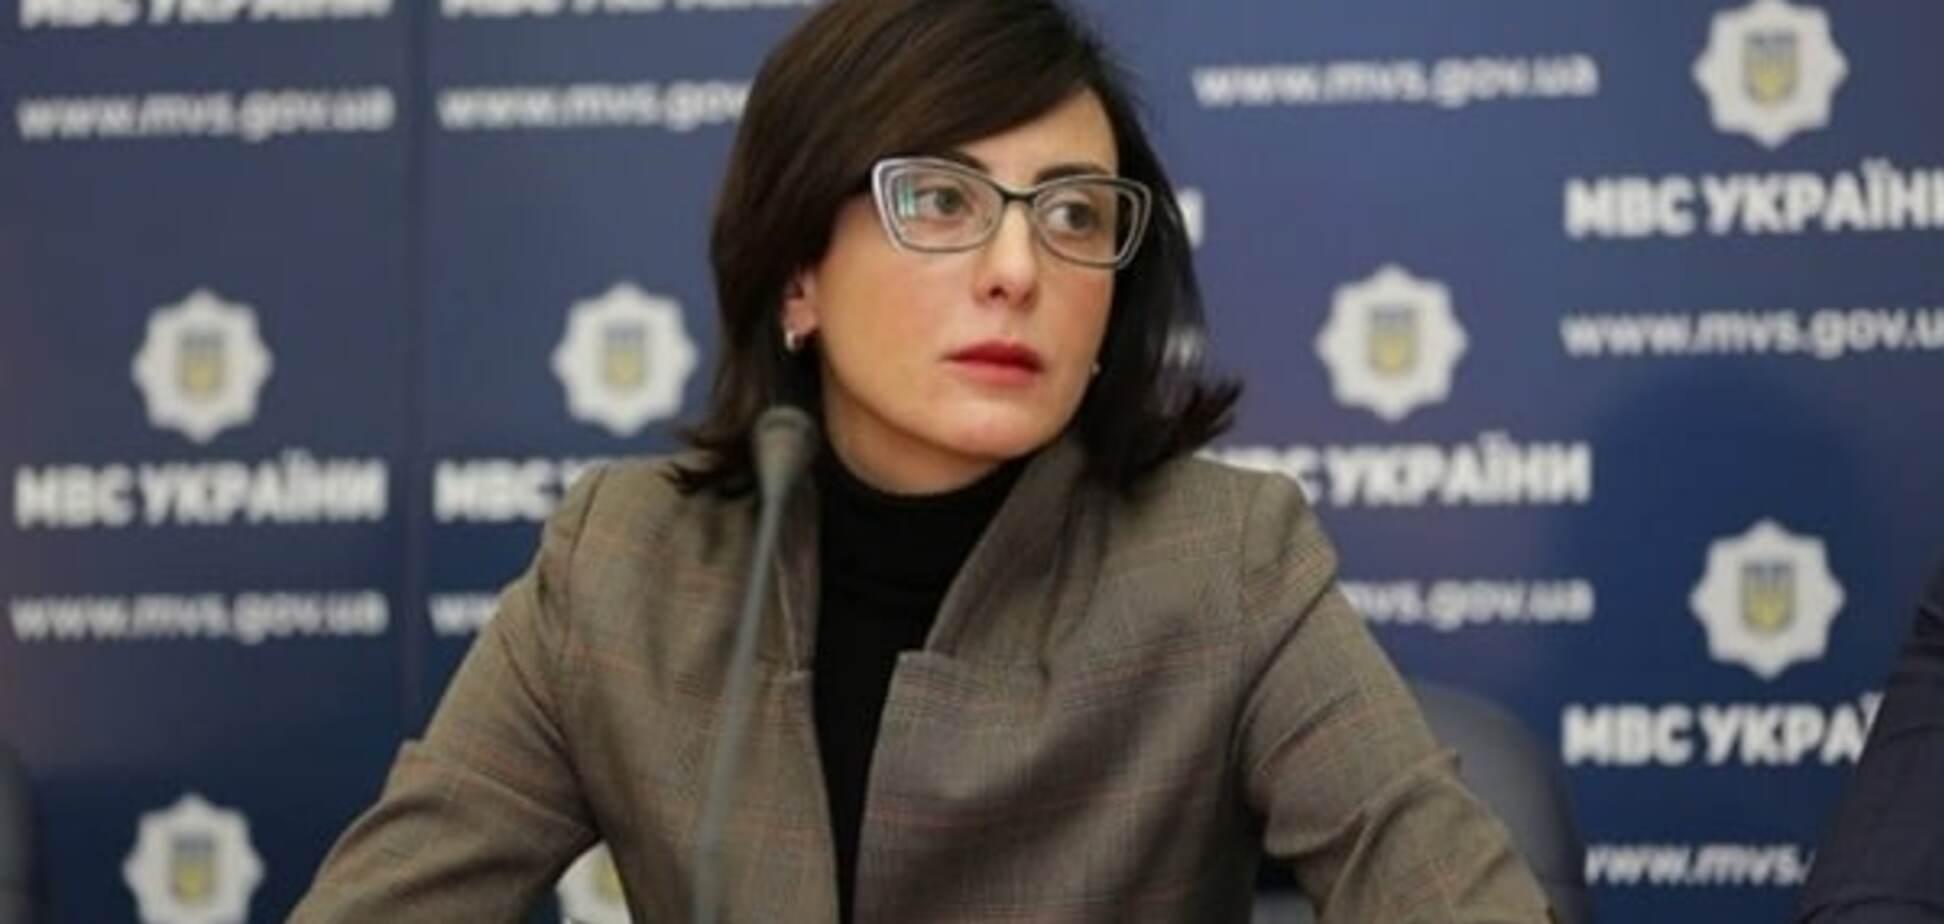 Хатия Деканоидзе, реформа полиции